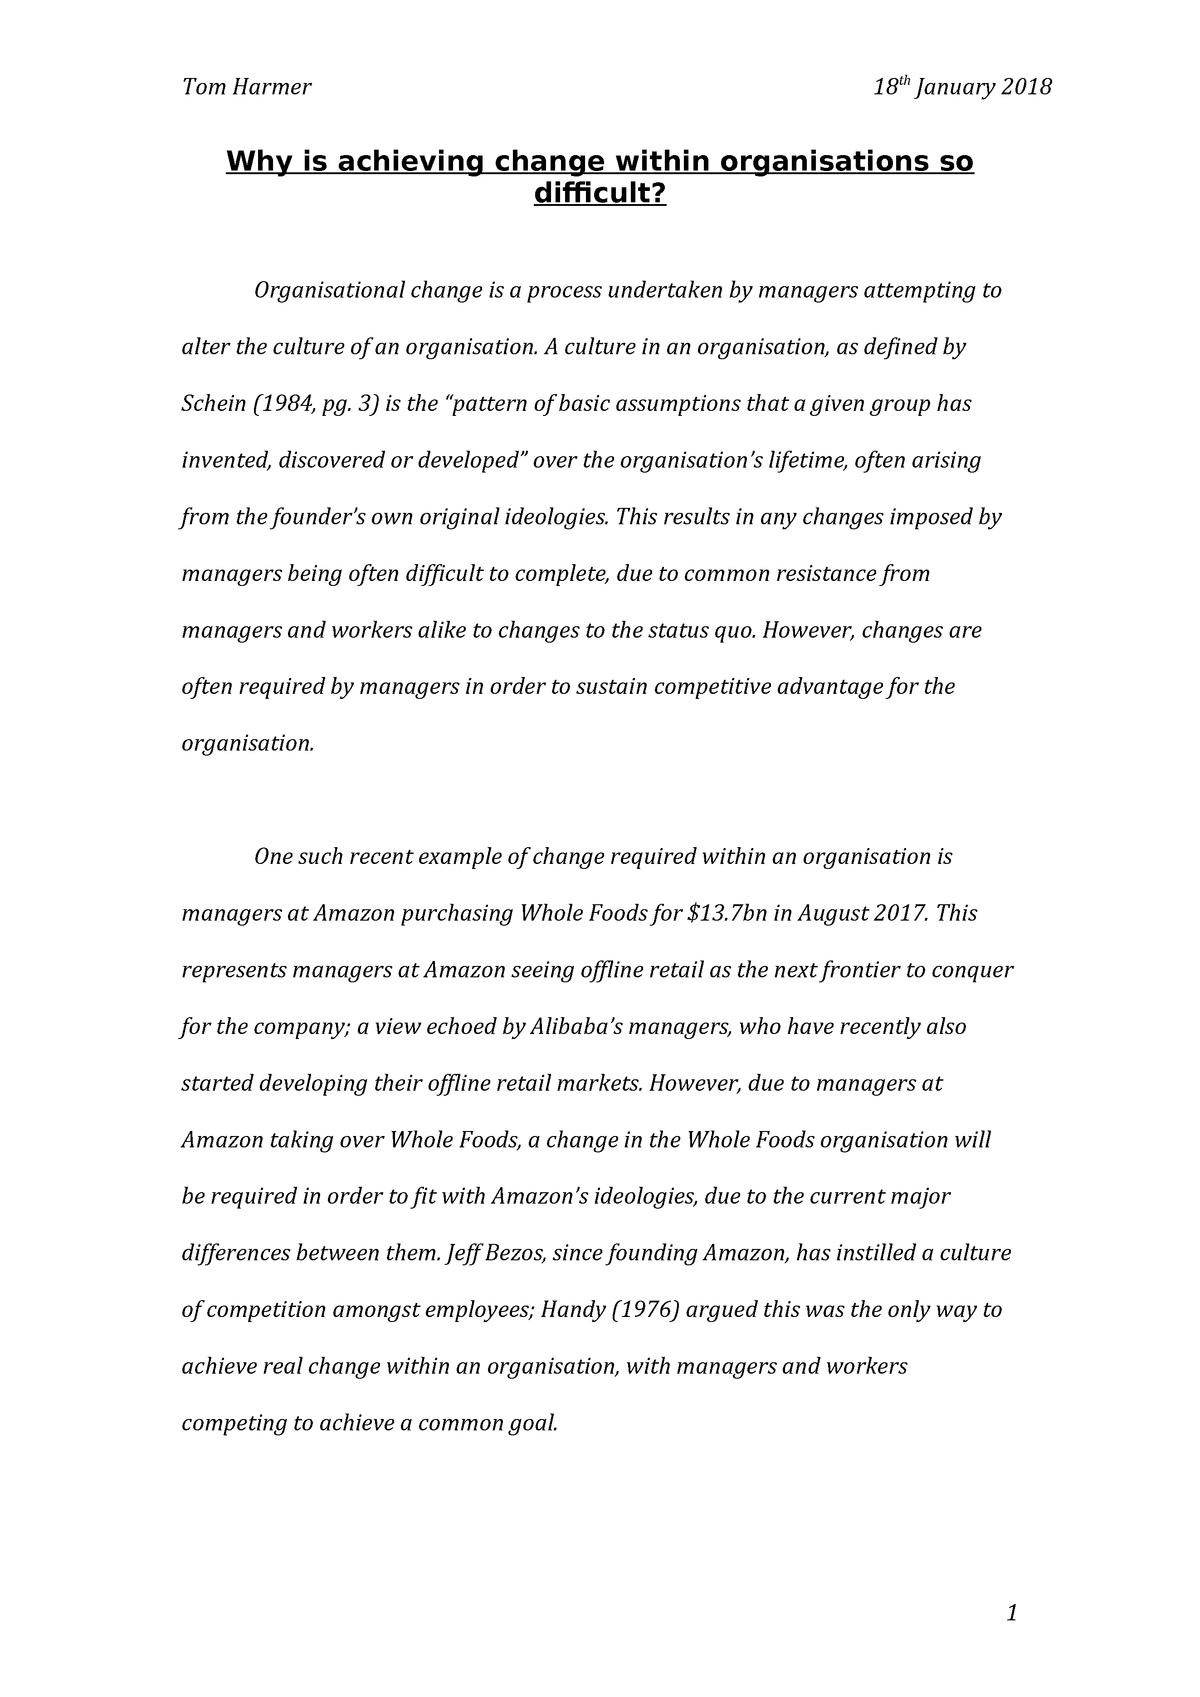 Hilary Essay Wk 1 - General Management - StuDocu